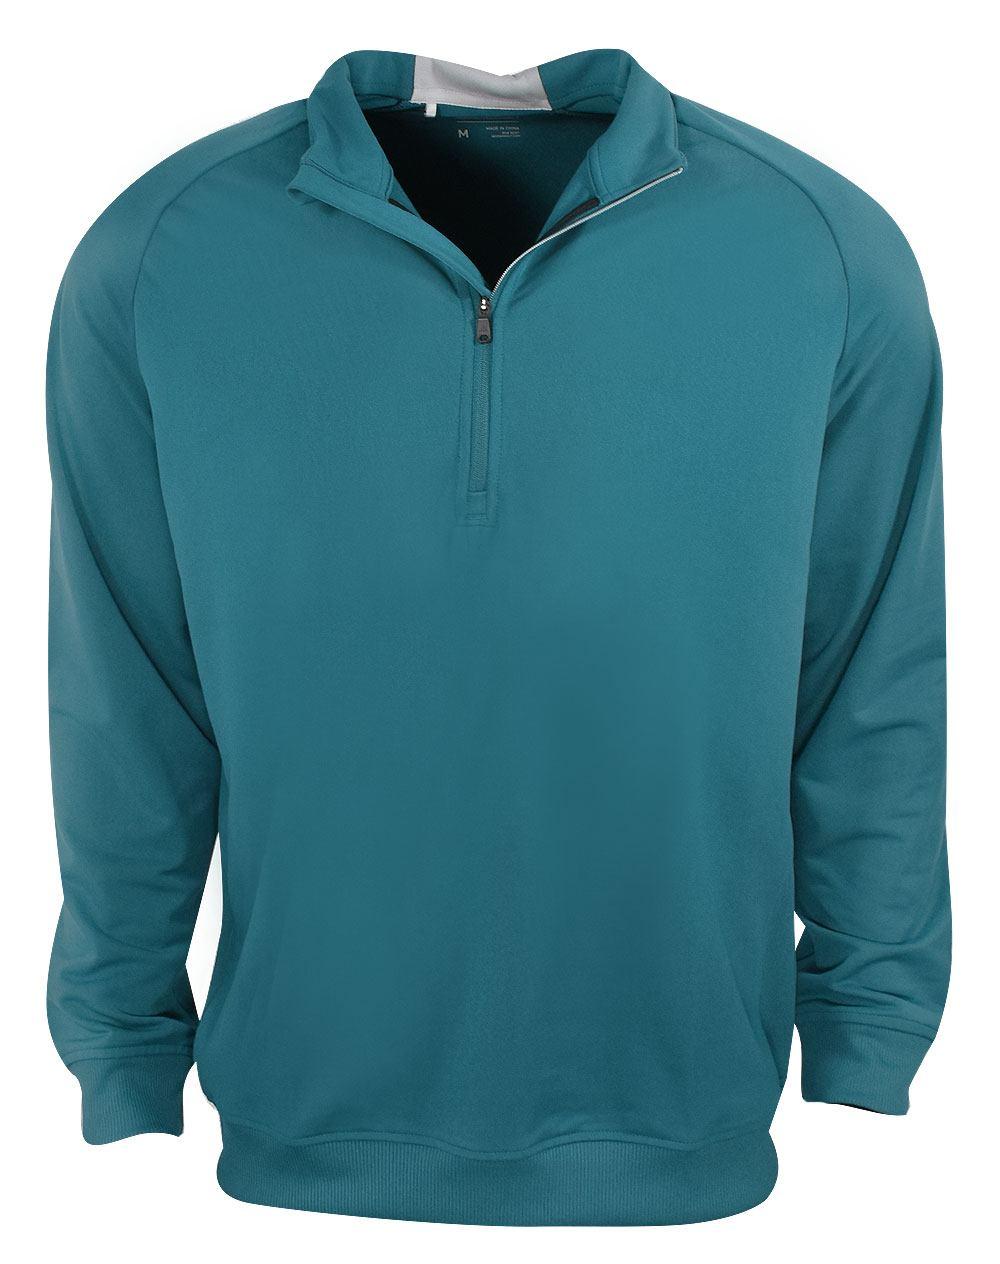 Adidas Golf Club 1 4 Zip Pullover image